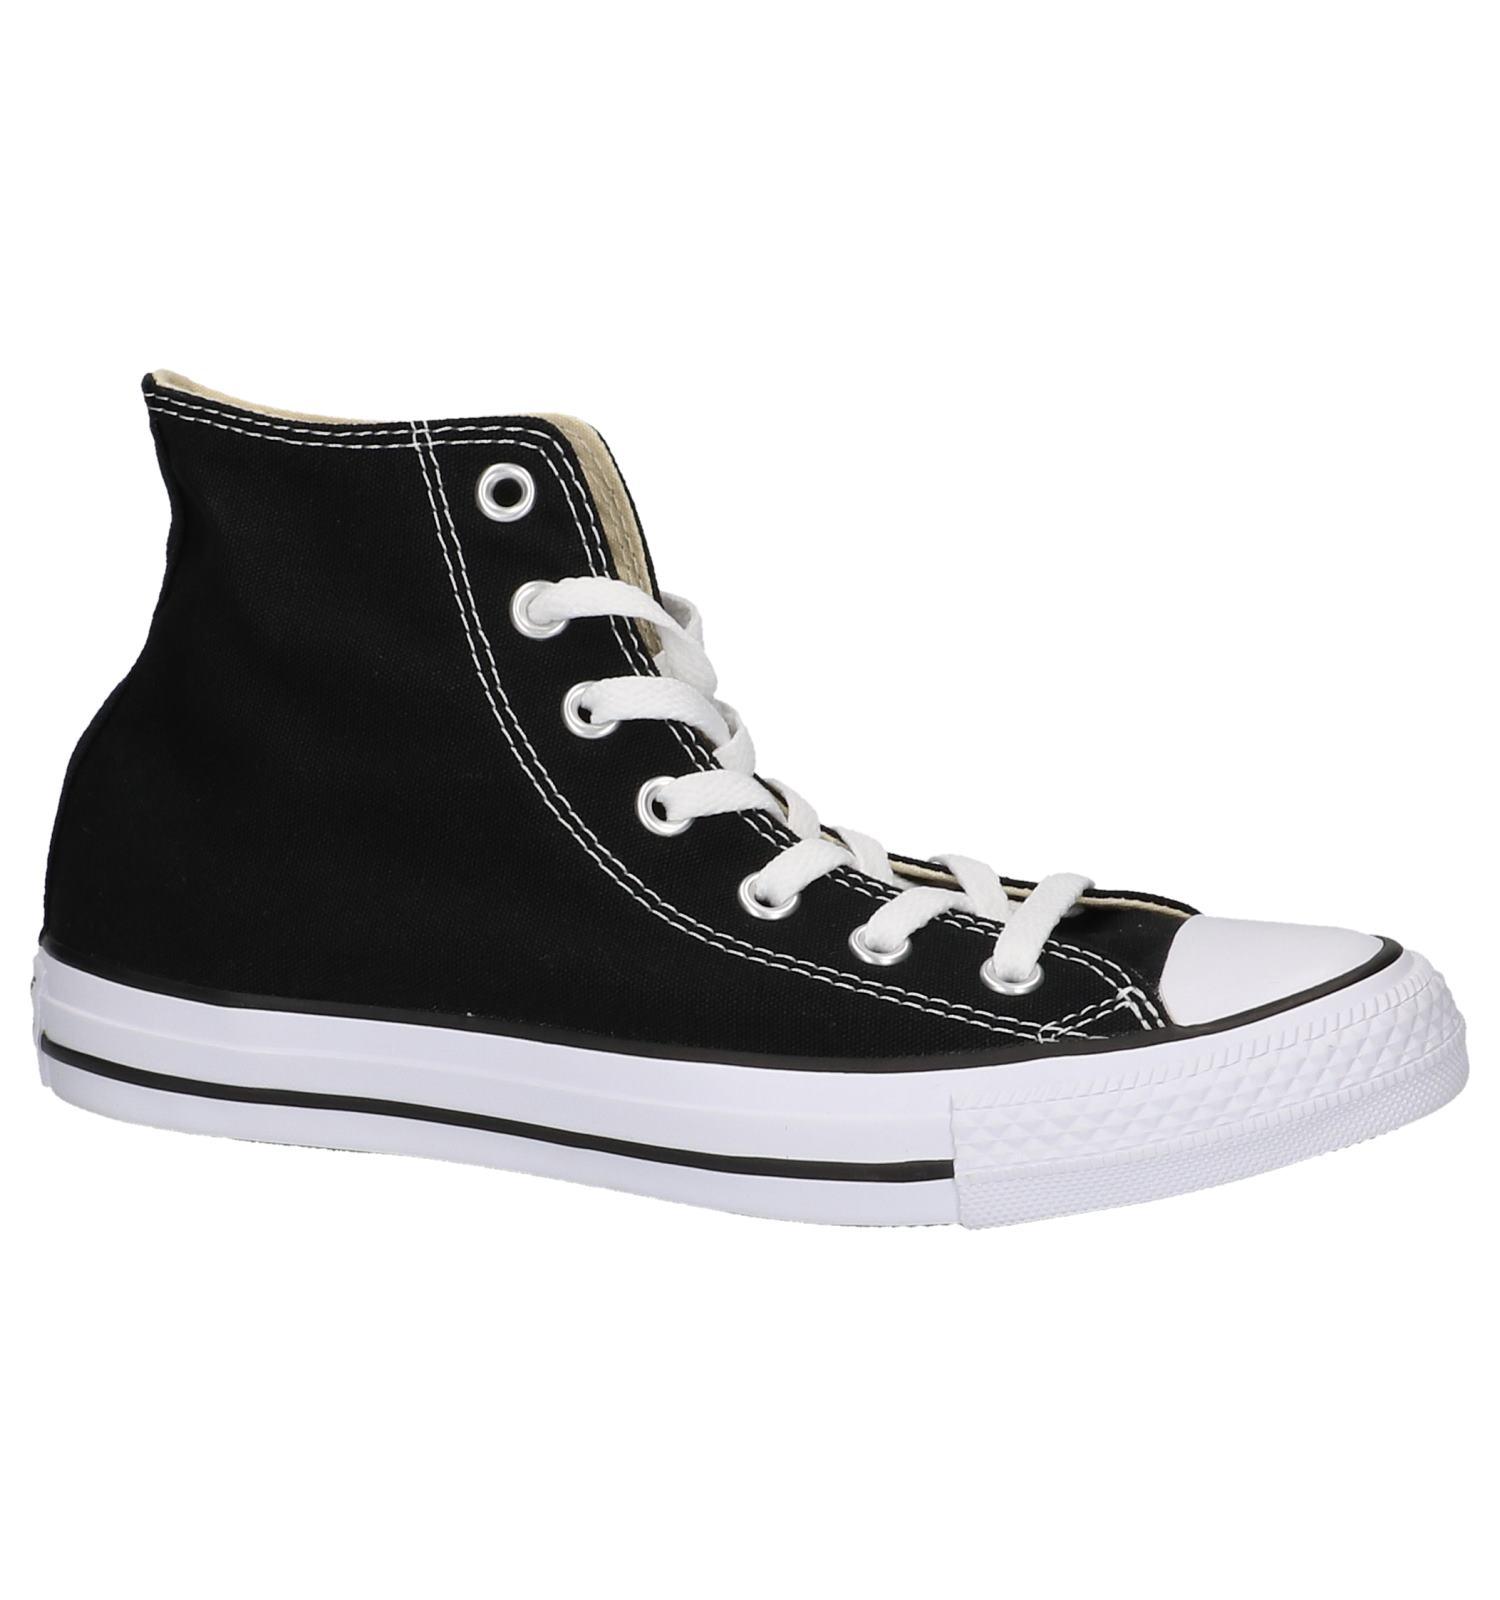 zwarte converse all stars